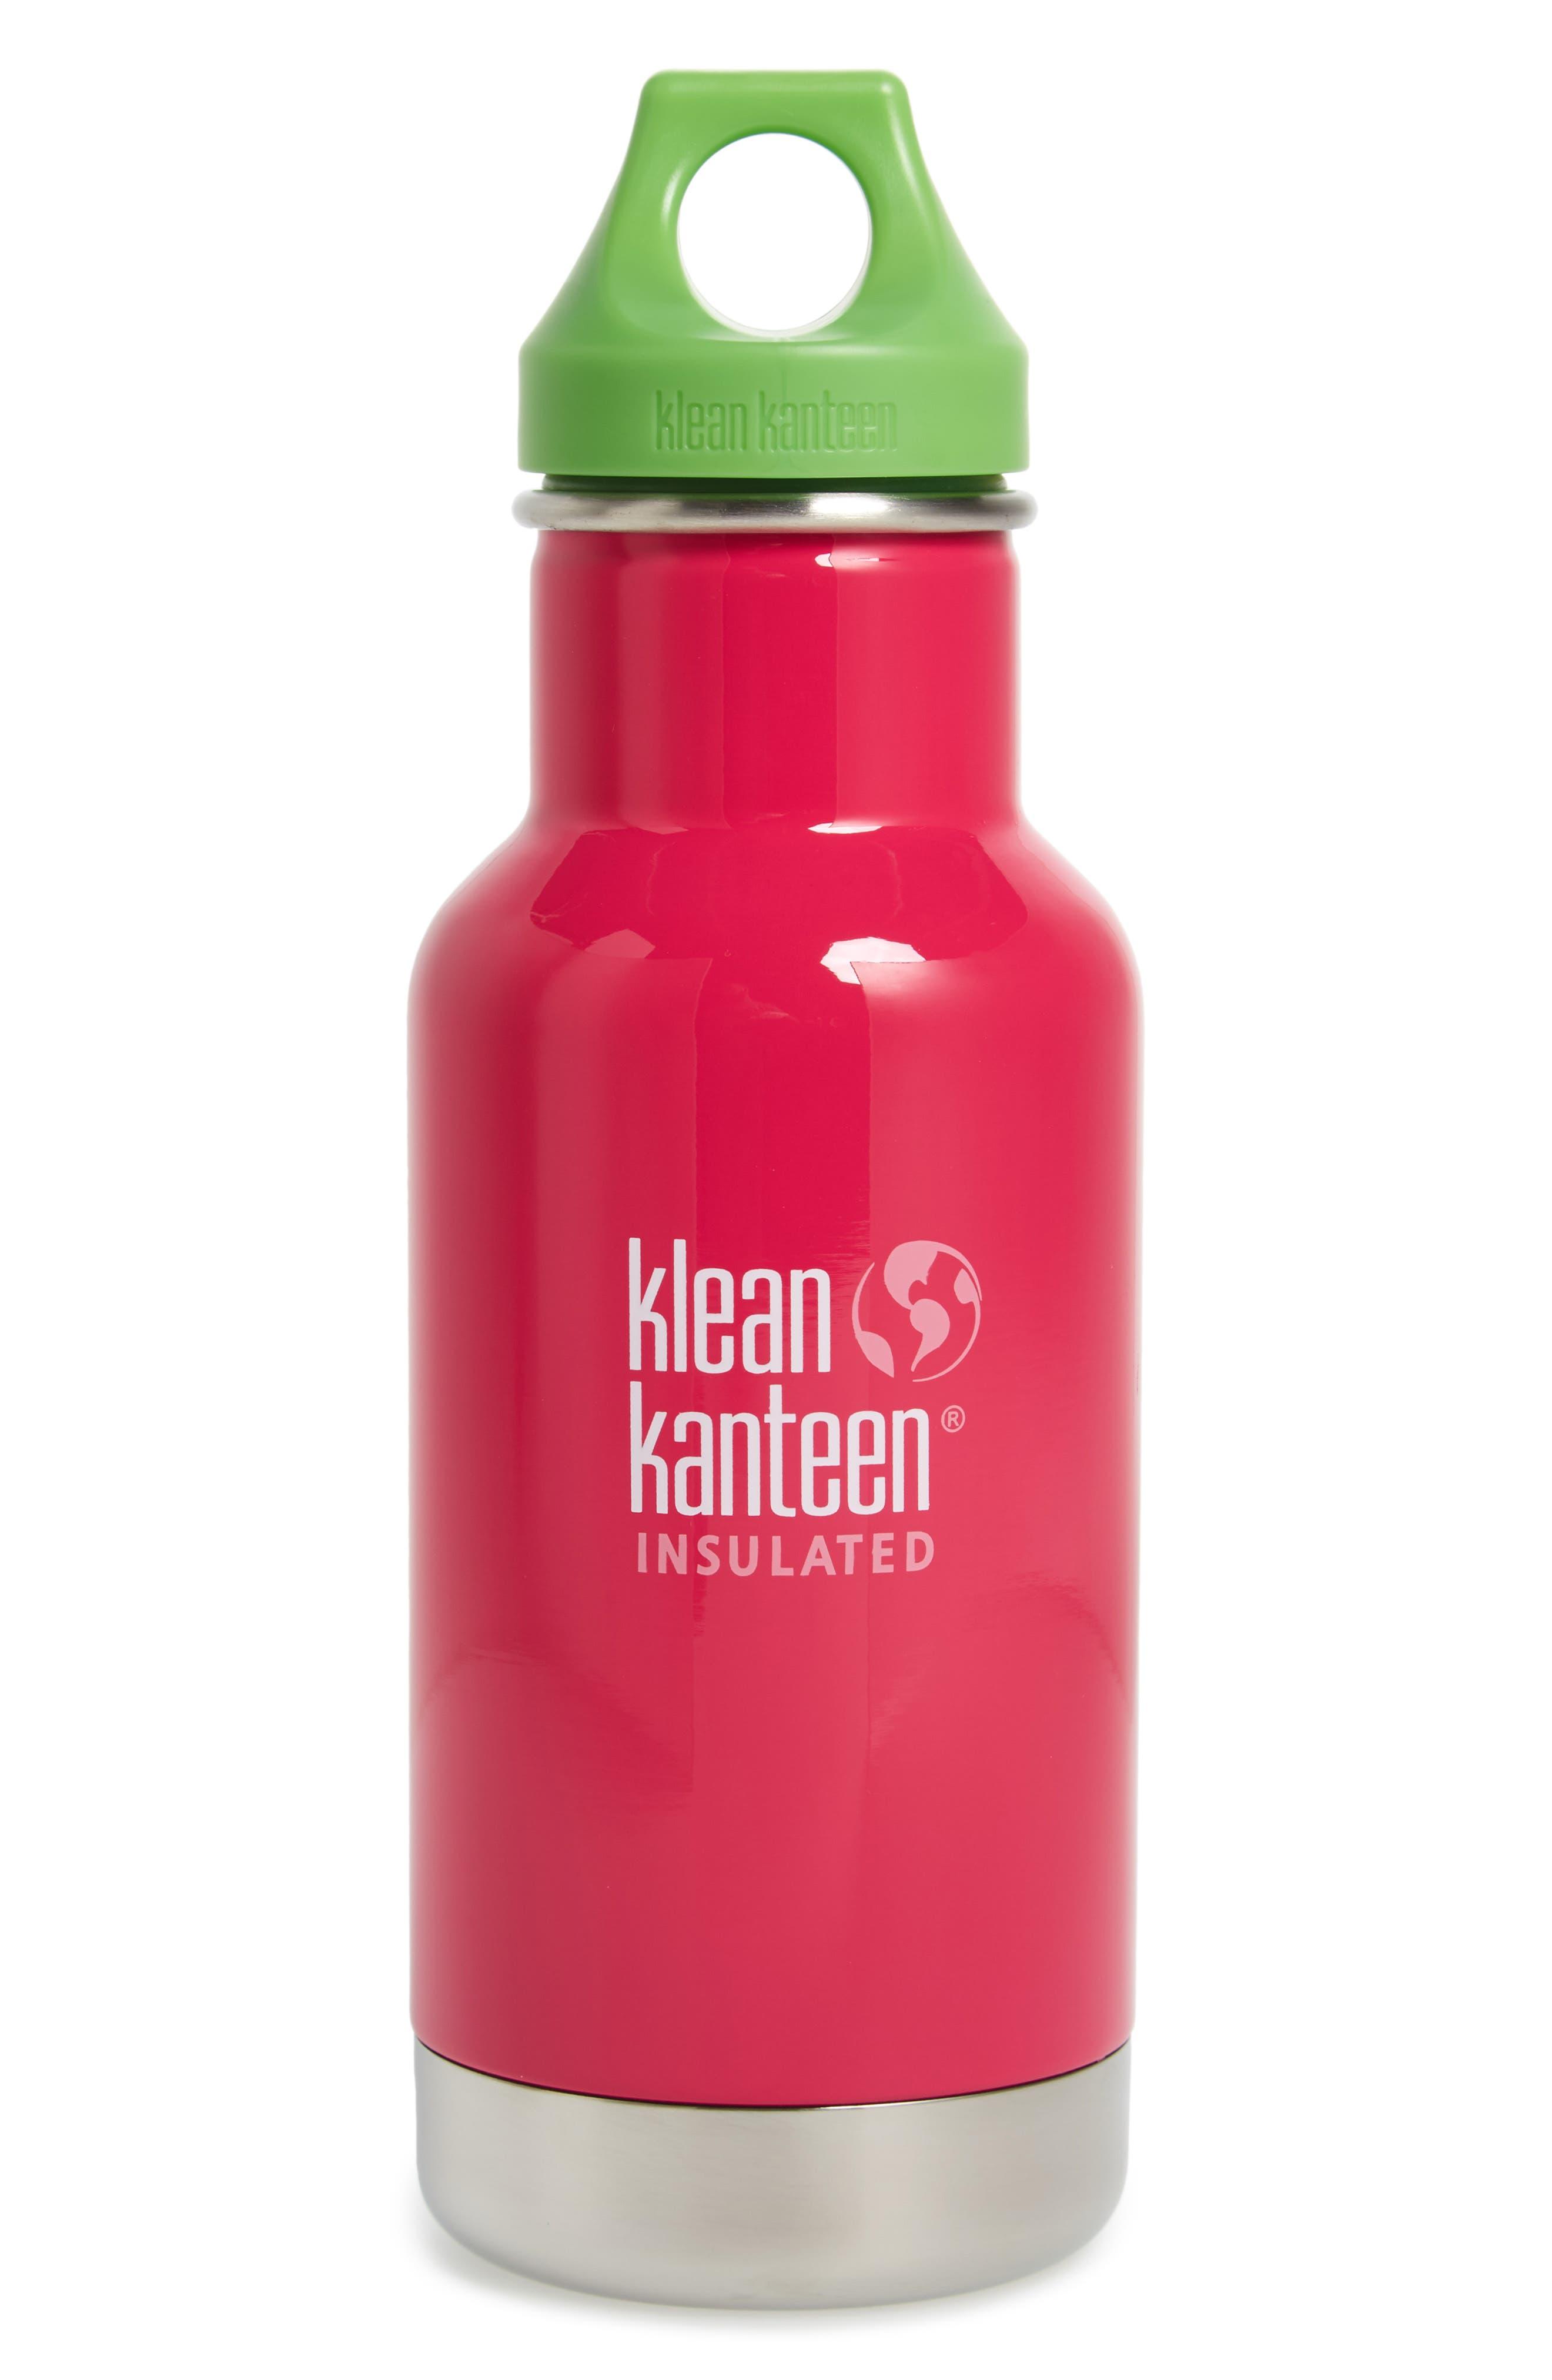 KLEAN KANTEEN Kid Kanteen Vacuum Insulated Bottle